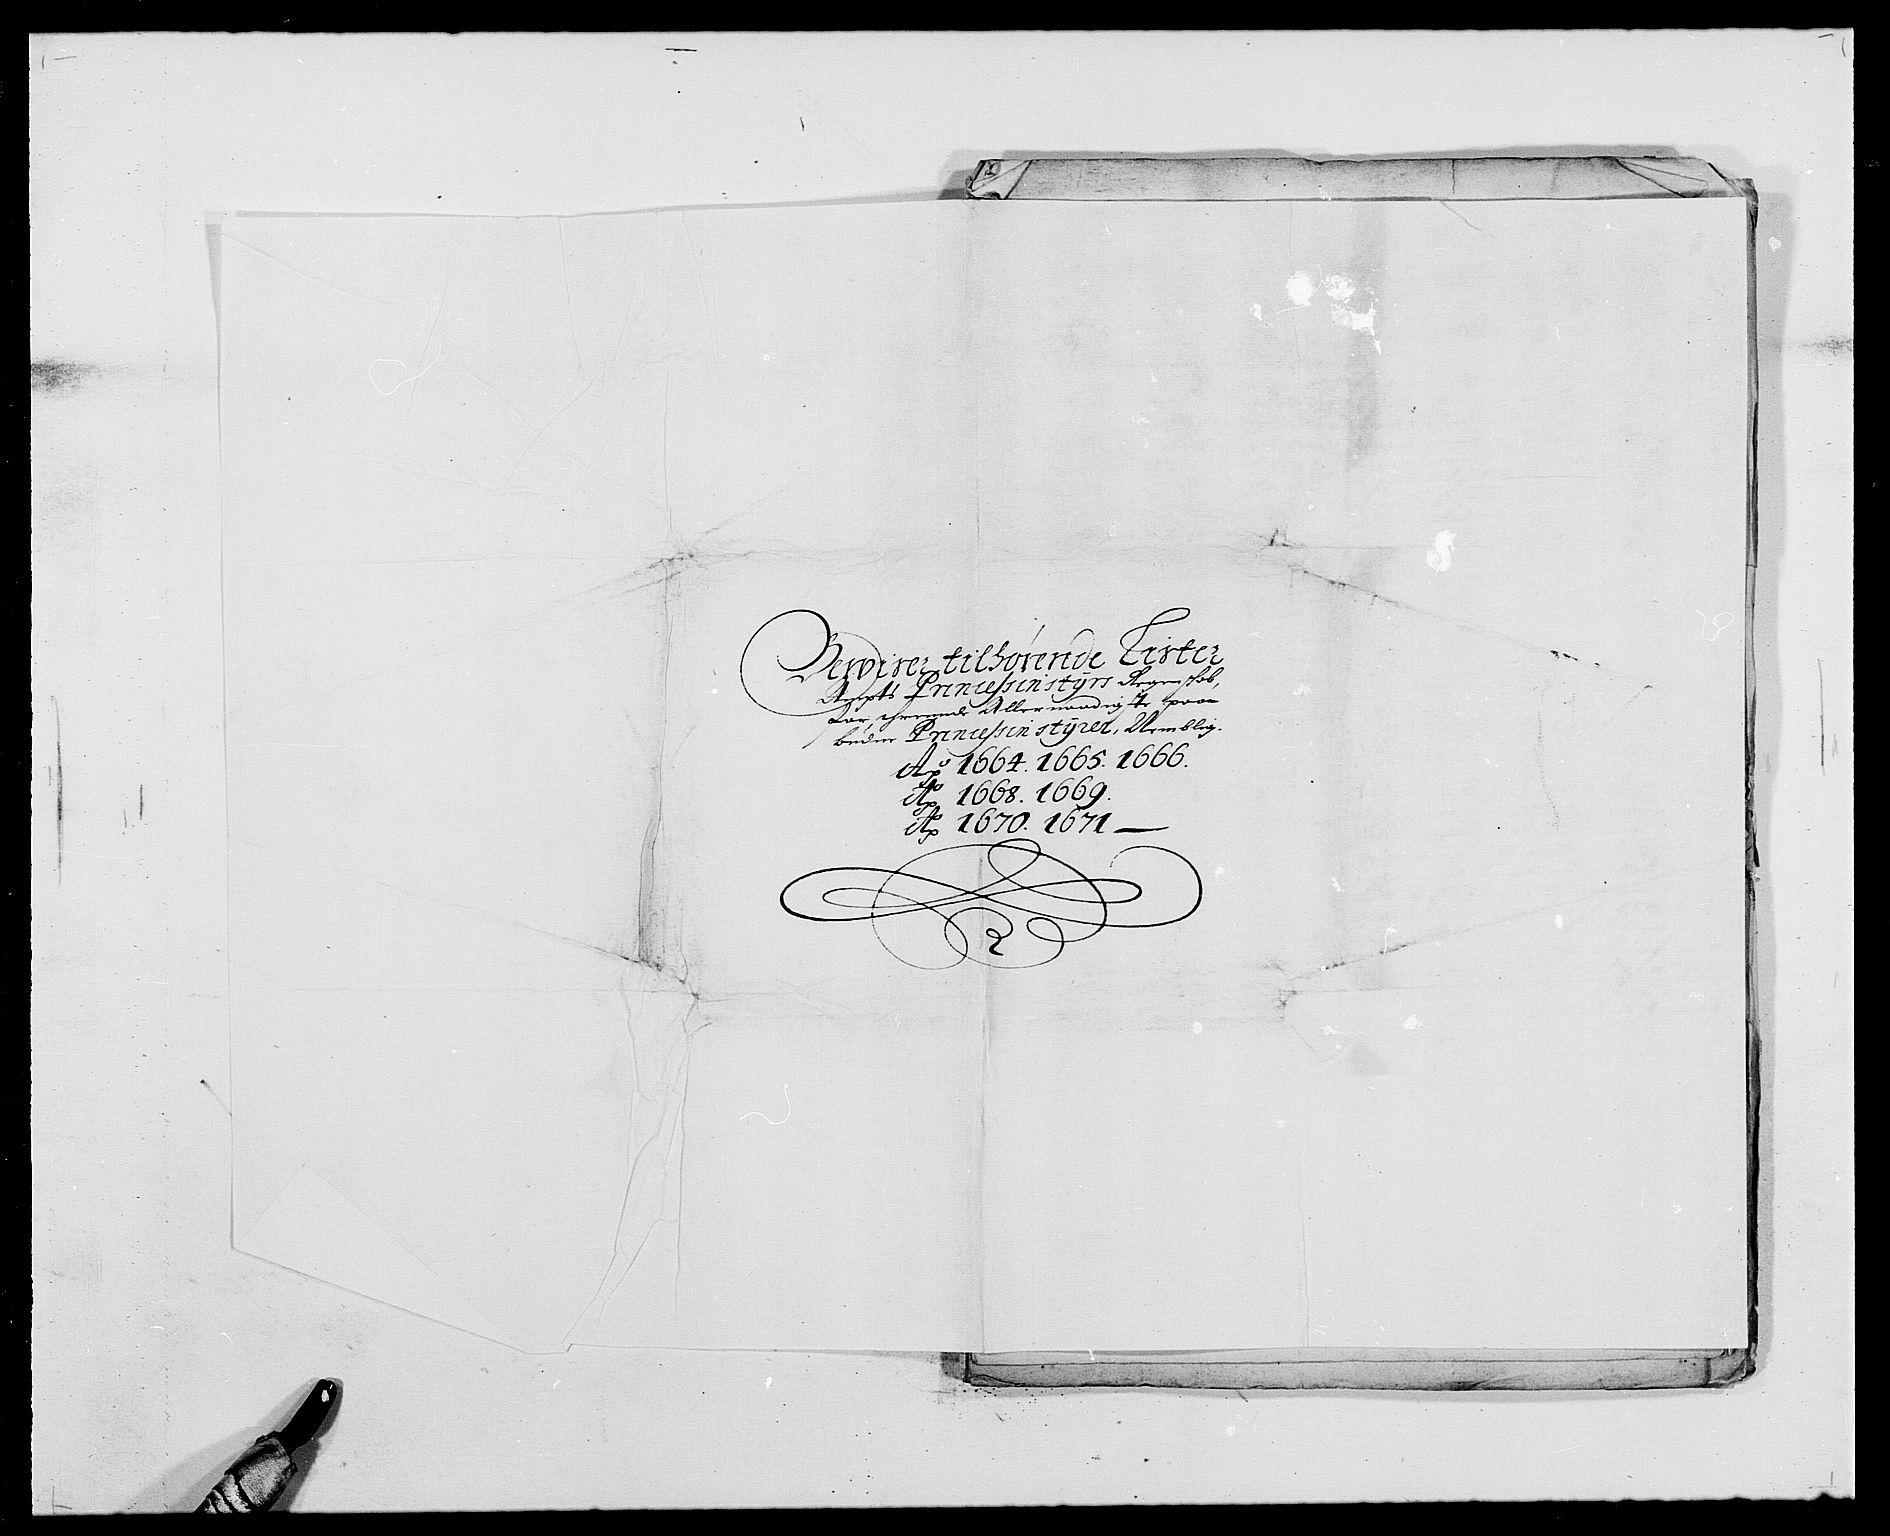 RA, Rentekammeret inntil 1814, Reviderte regnskaper, Fogderegnskap, R41/L2526: Fogderegnskap Lista, 1672, s. 162